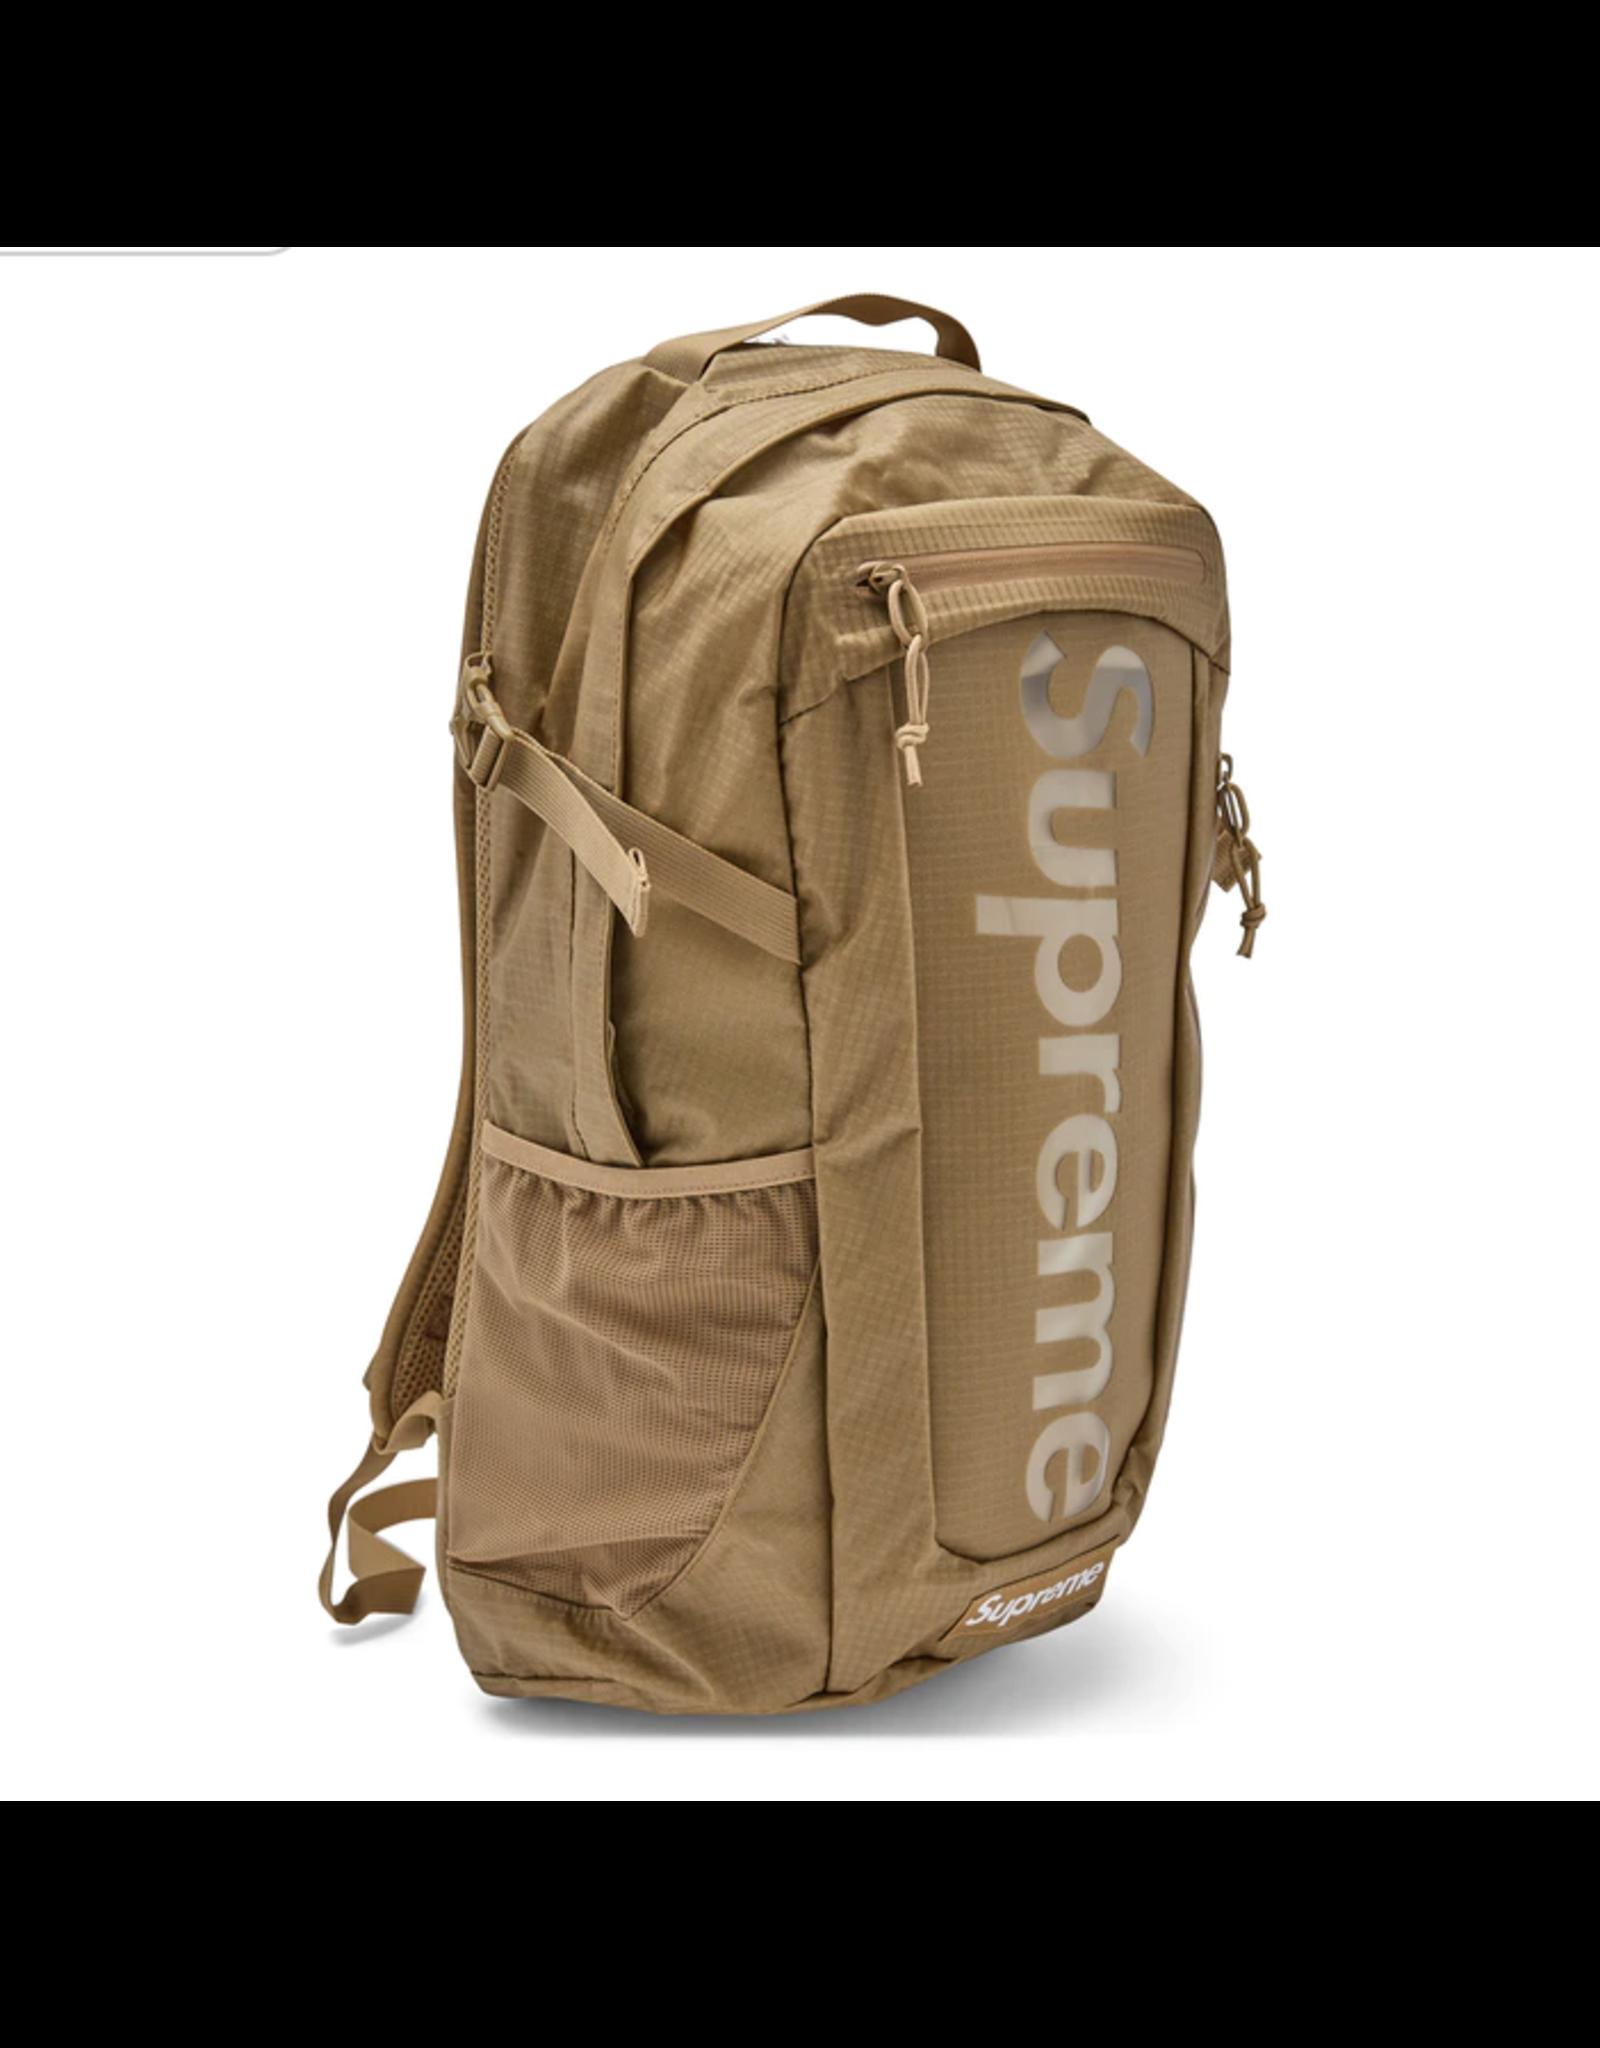 SUPREME Supreme Backpack Backpack (SS21) Tan